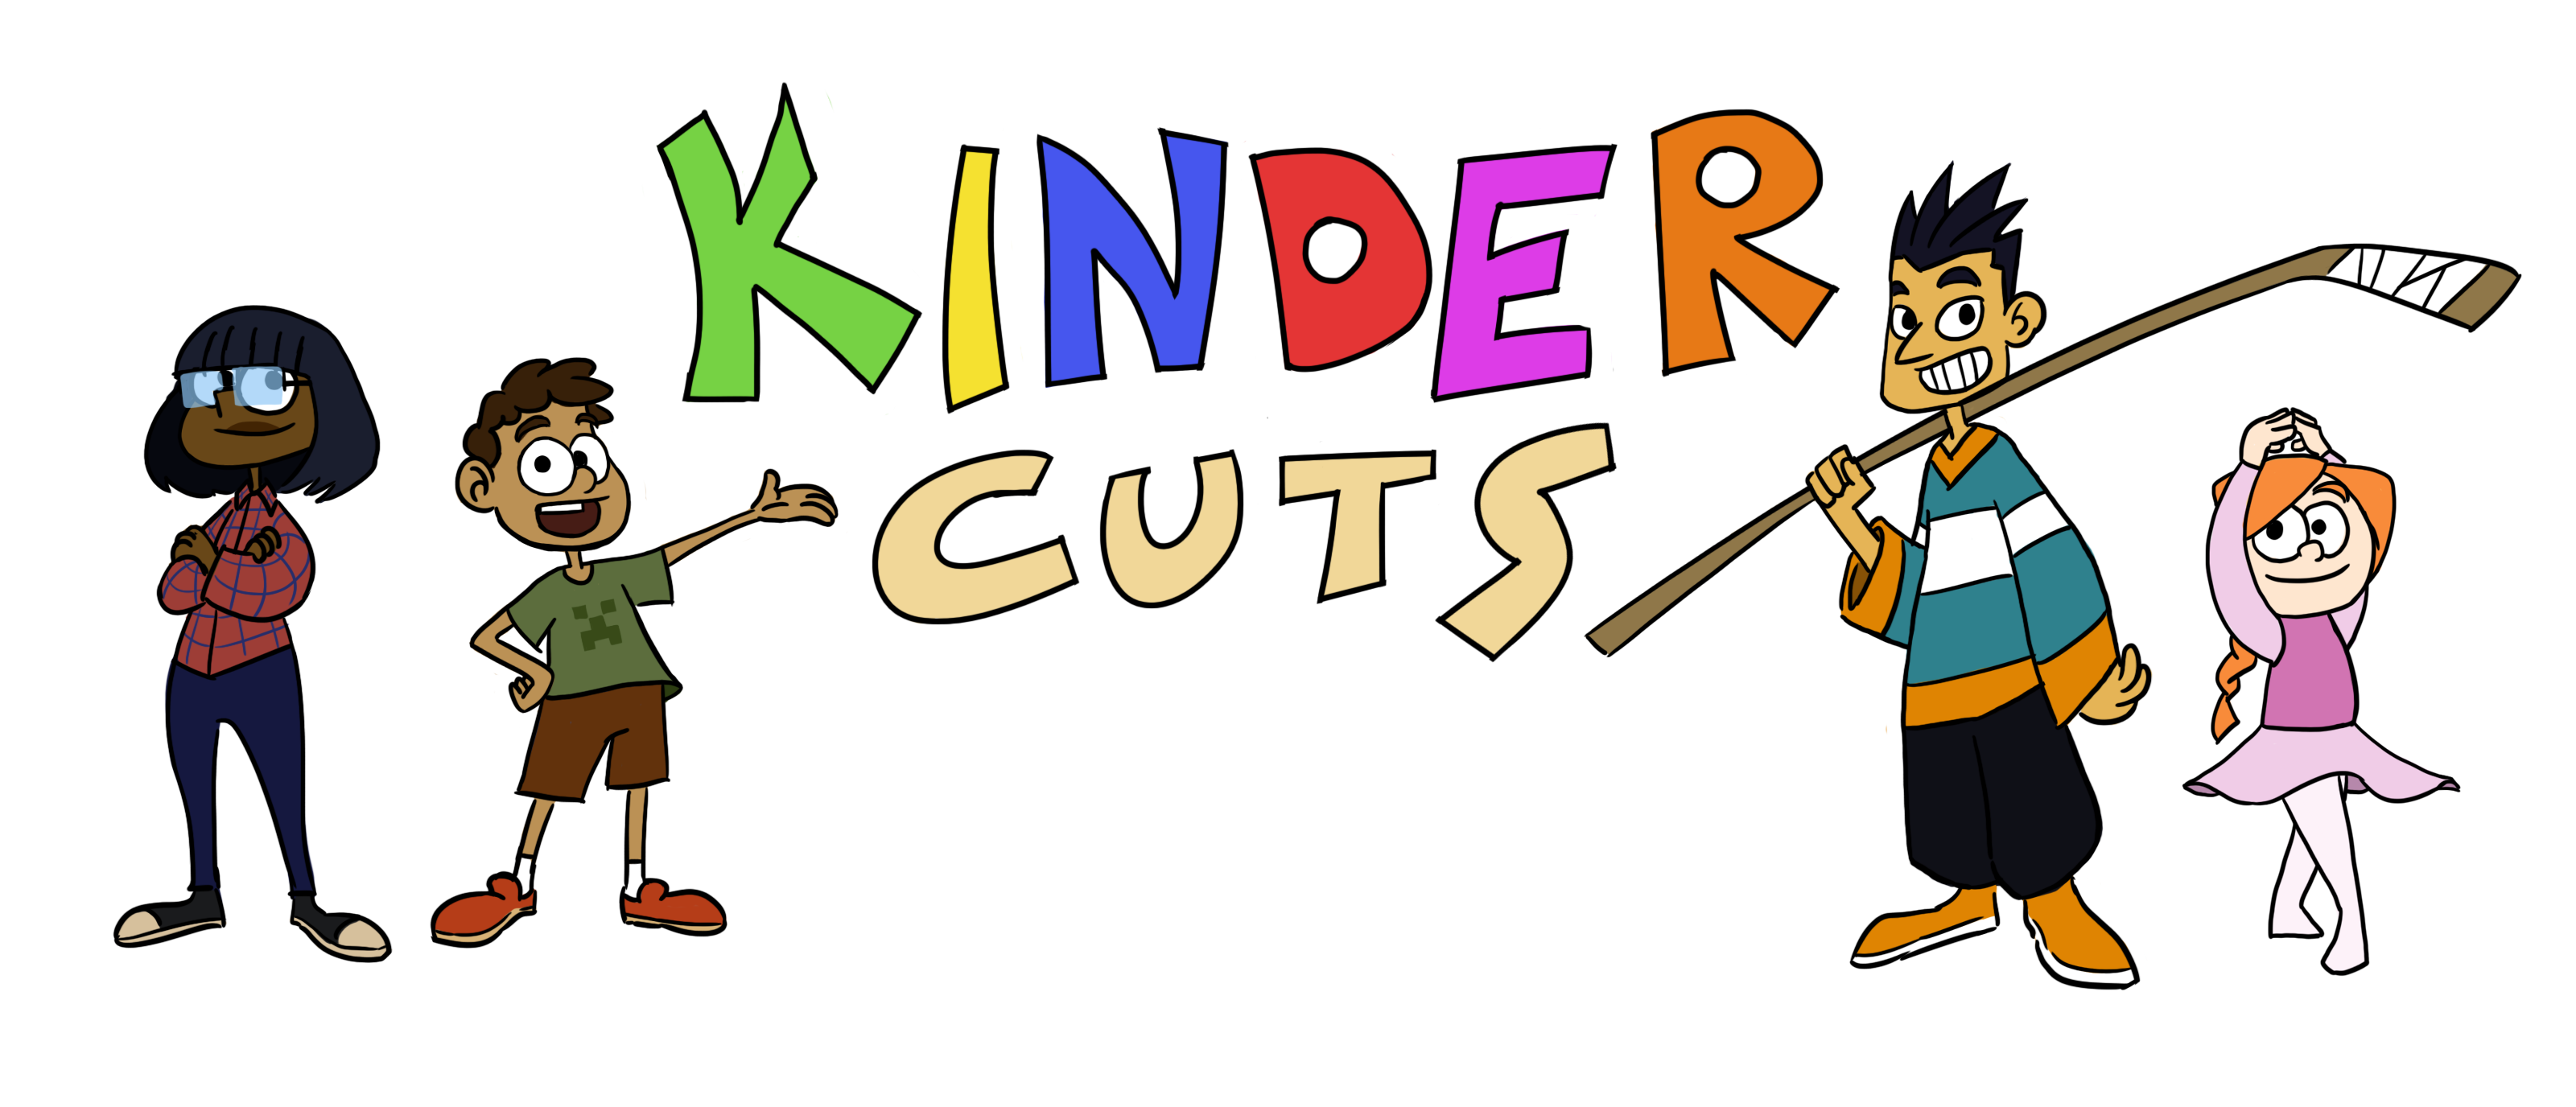 Kinder cuts kids blossom. Coupon clipart hair salon